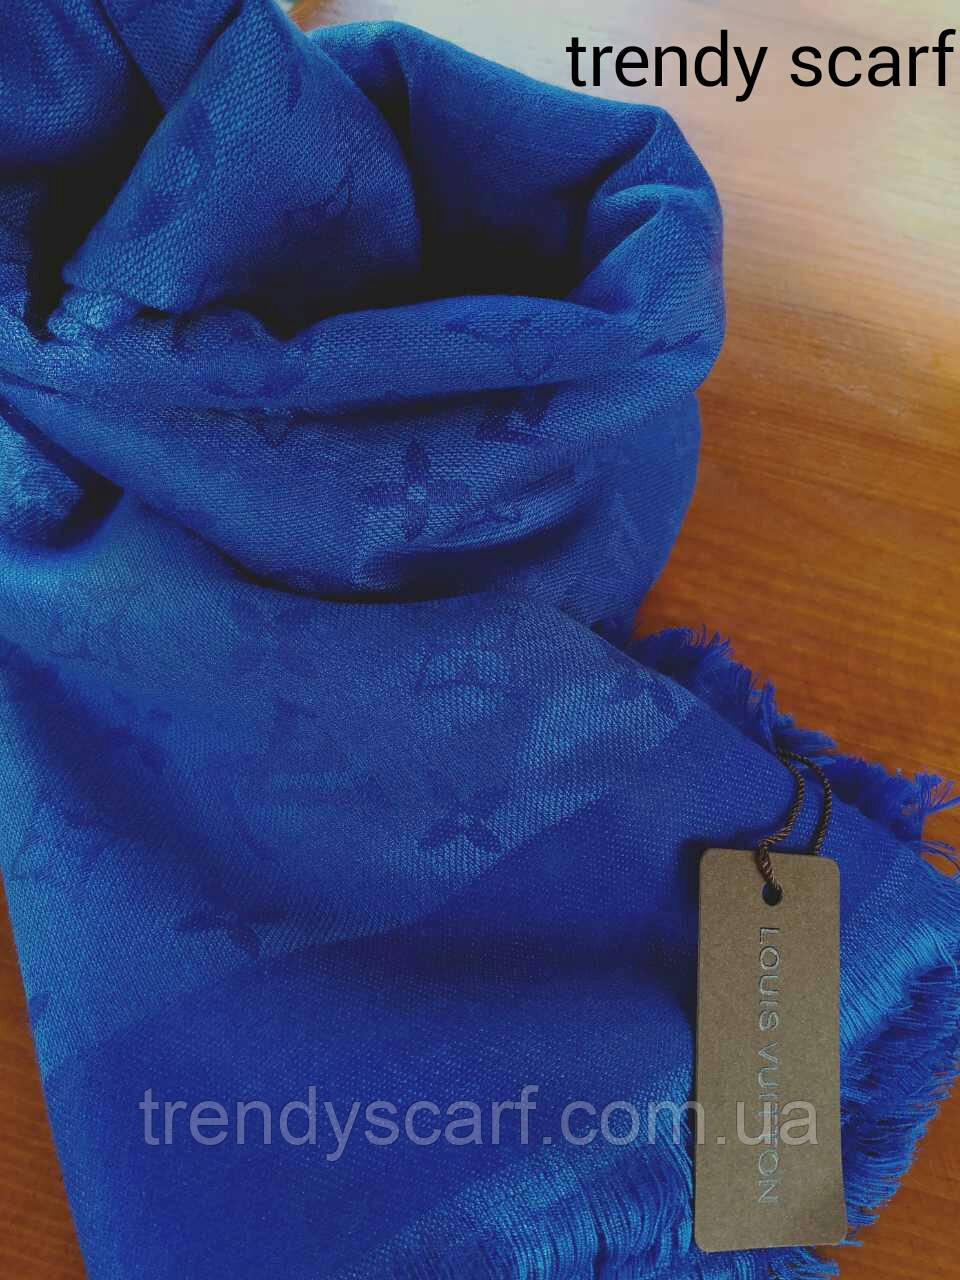 Женский Платок Louis Vuitton бренд Луи Виттон синий электрик цвет monogram  реплика шерсть шелк 140  f666ea7c154